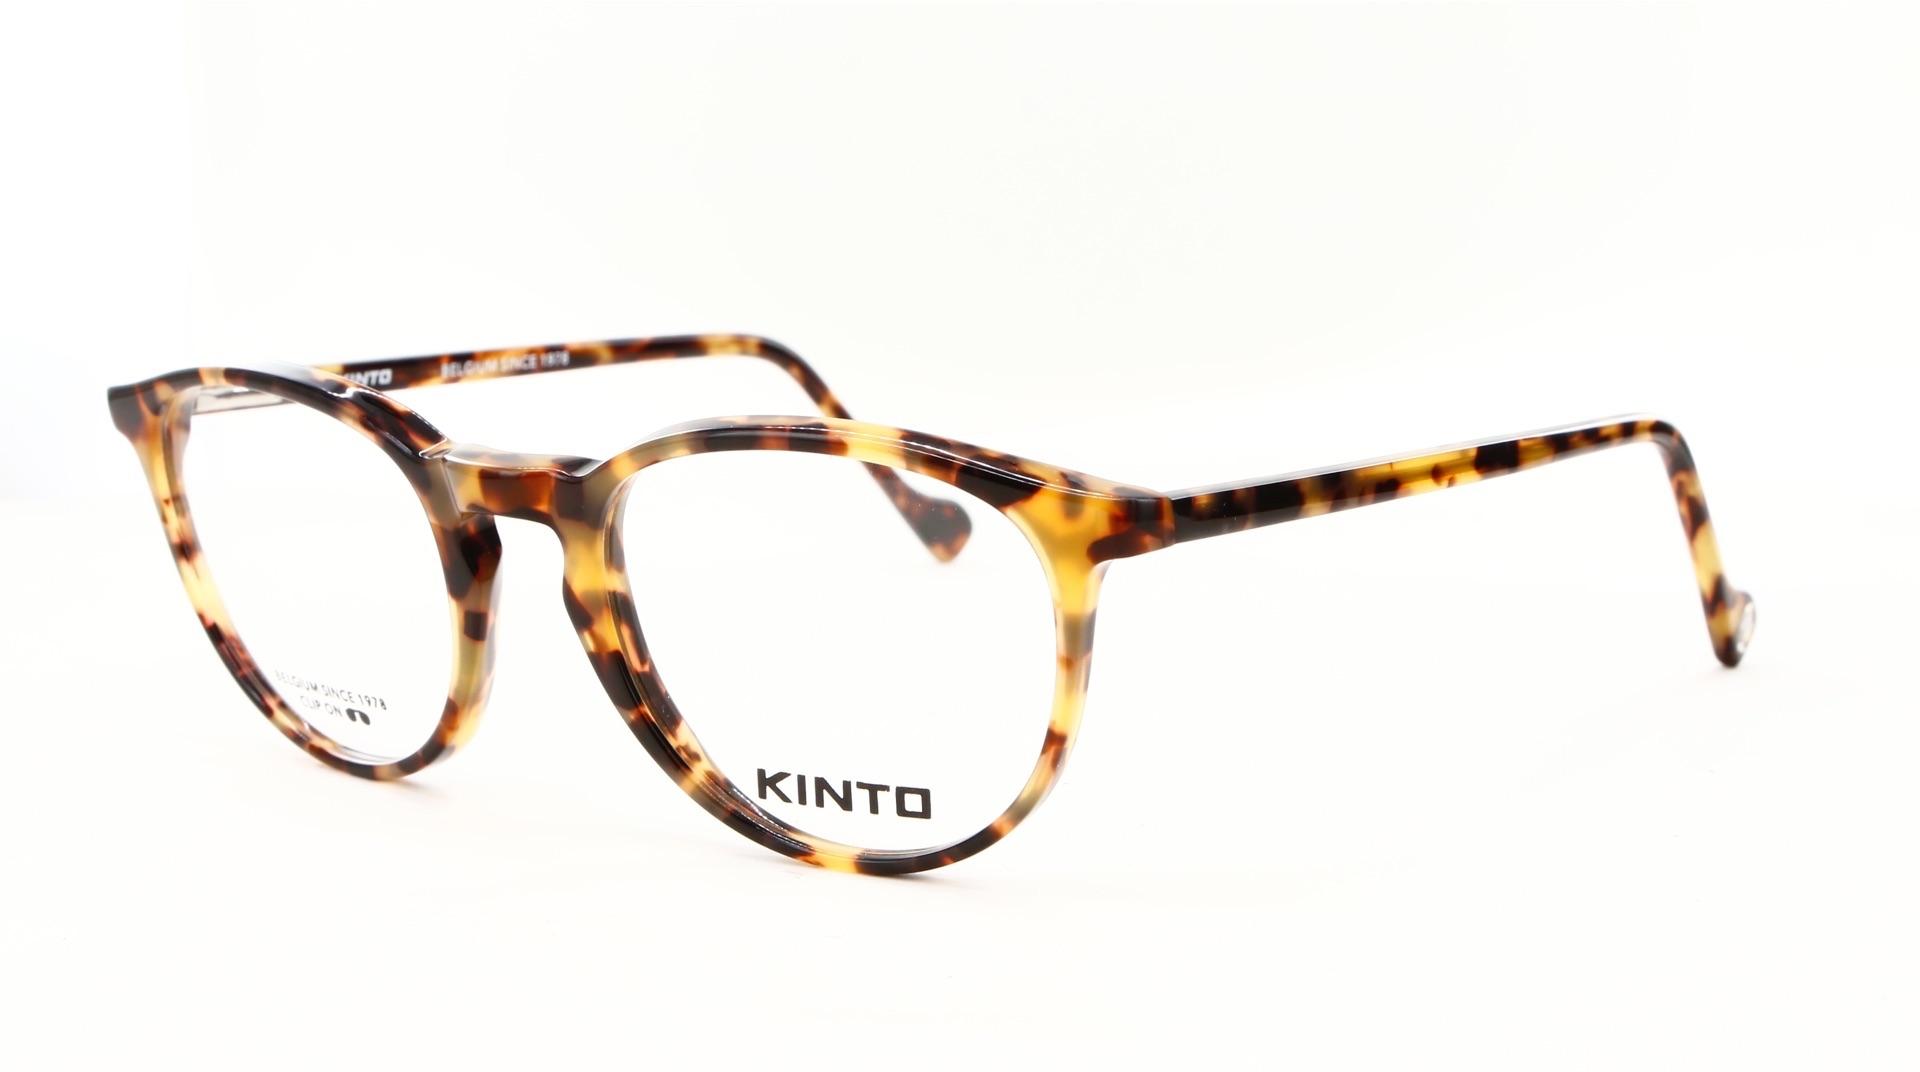 Kinto - ref: 80080